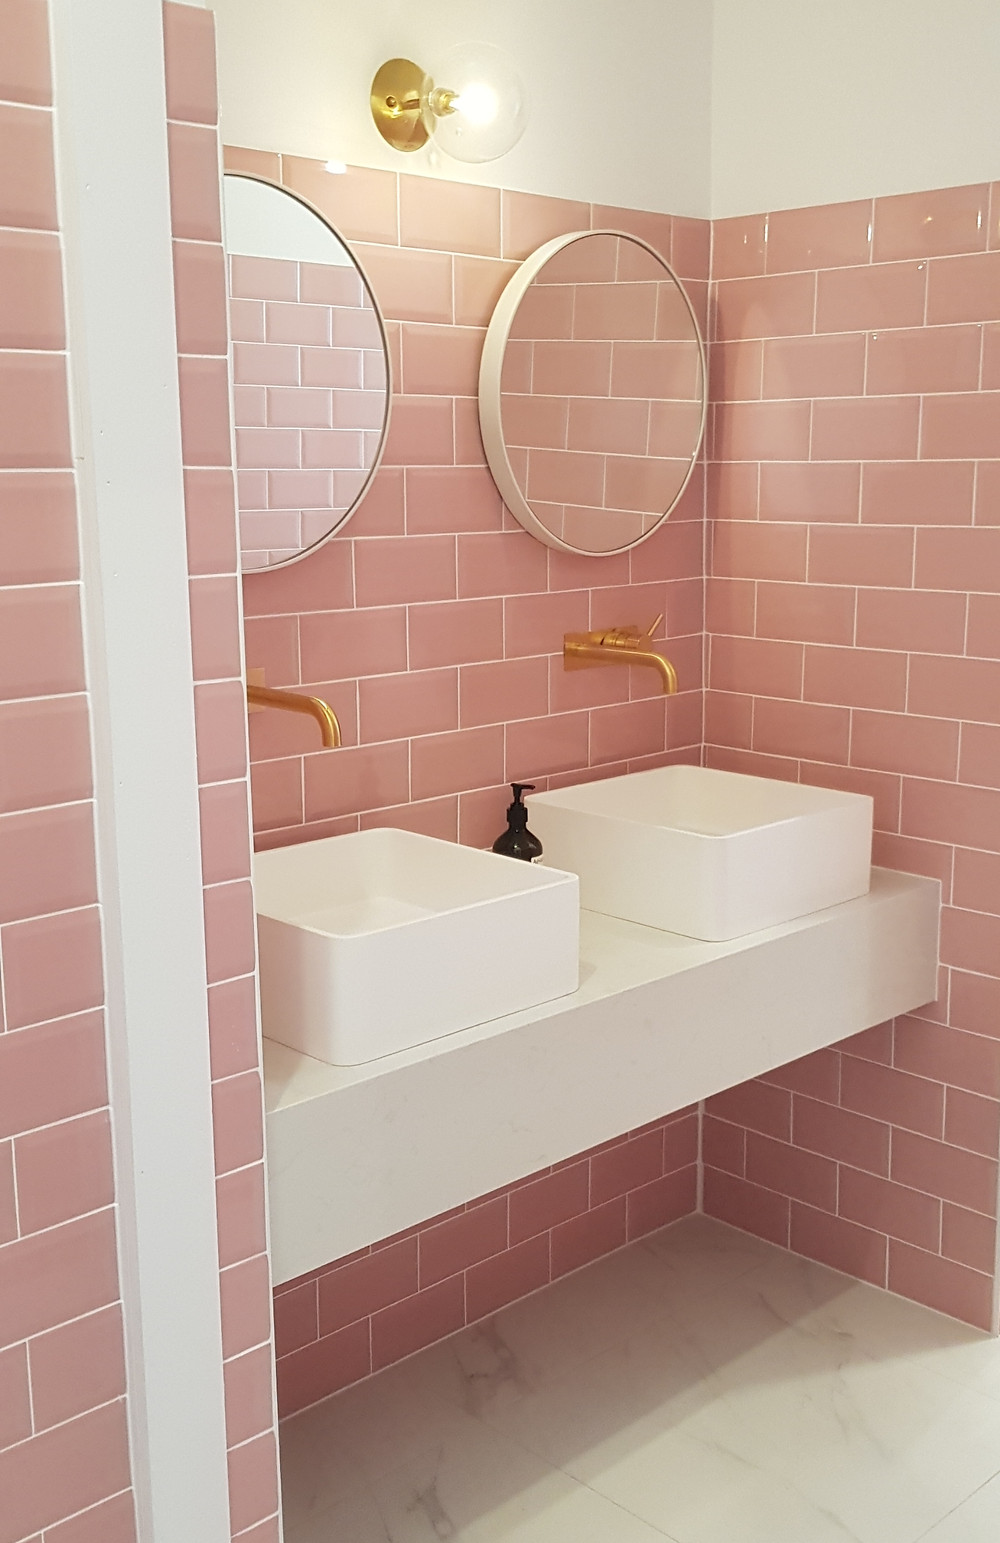 The Social Club Kingston, pretty pink toilets